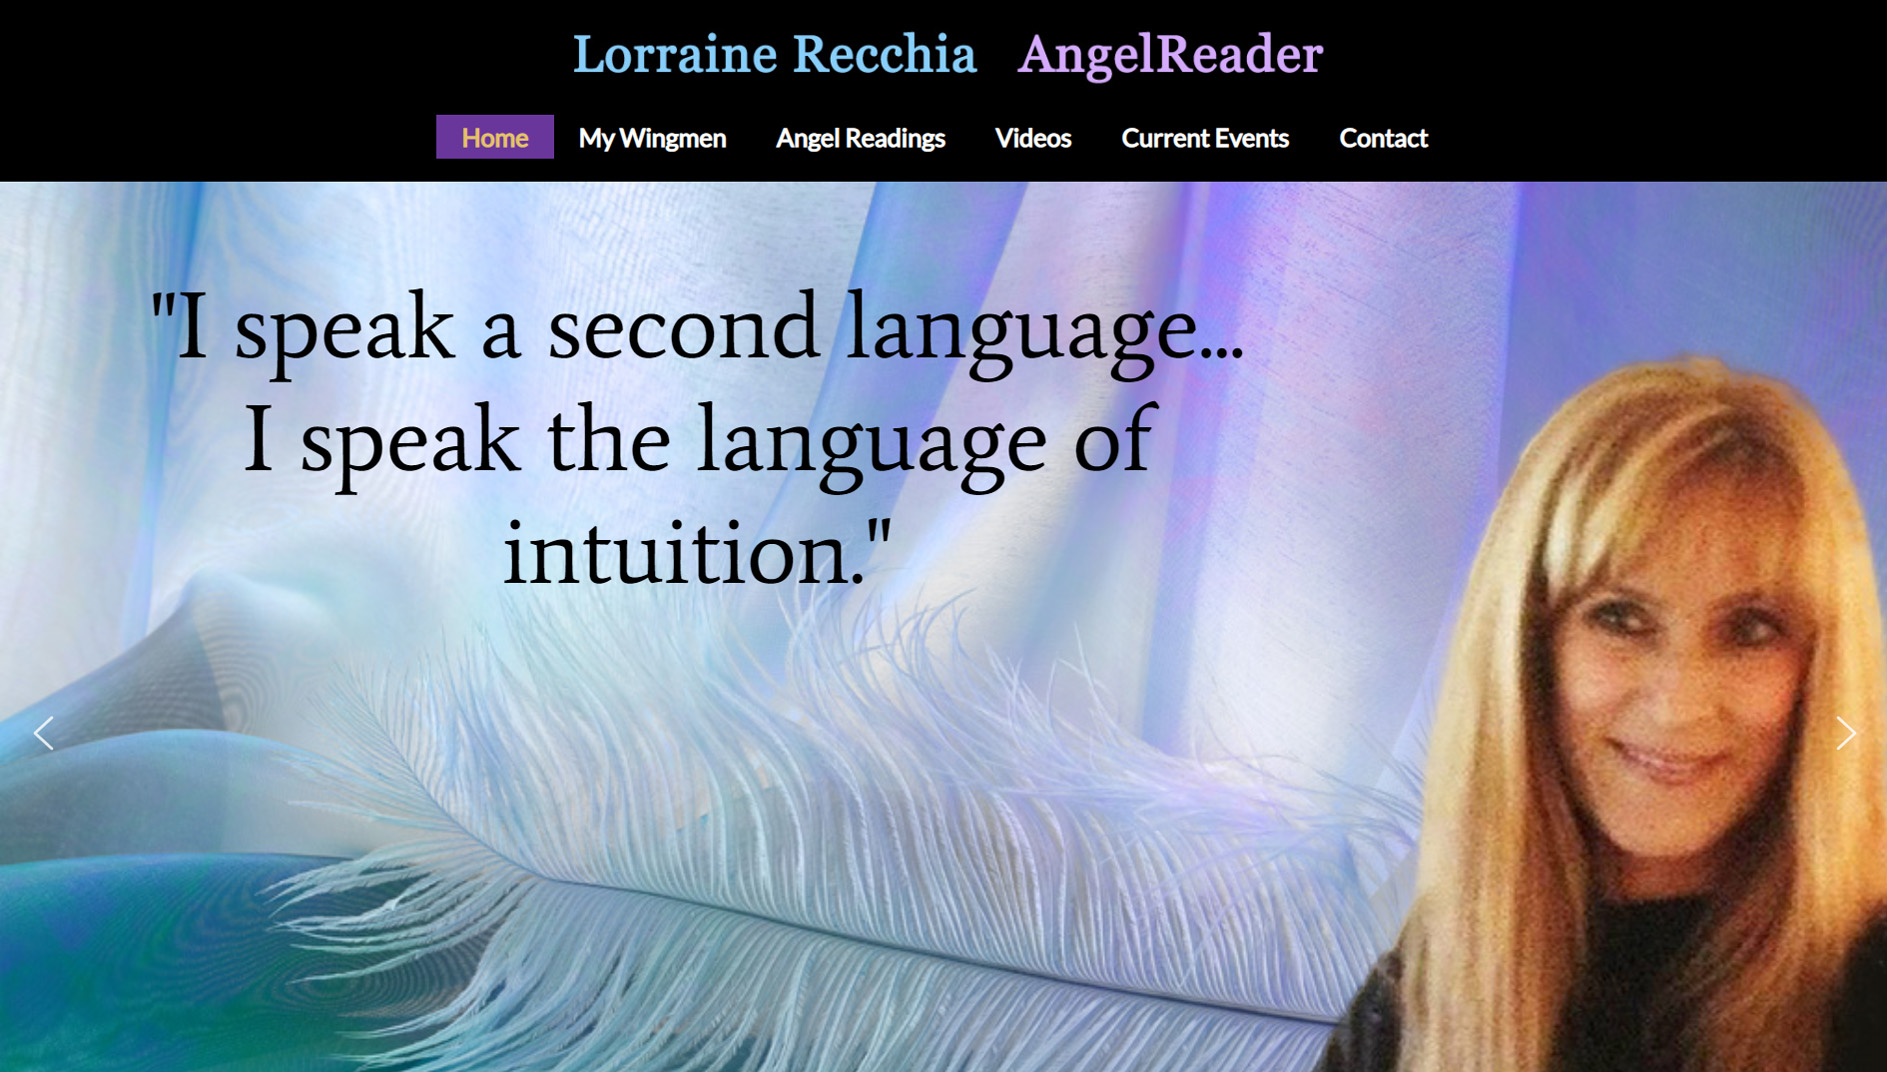 Angel_Reader